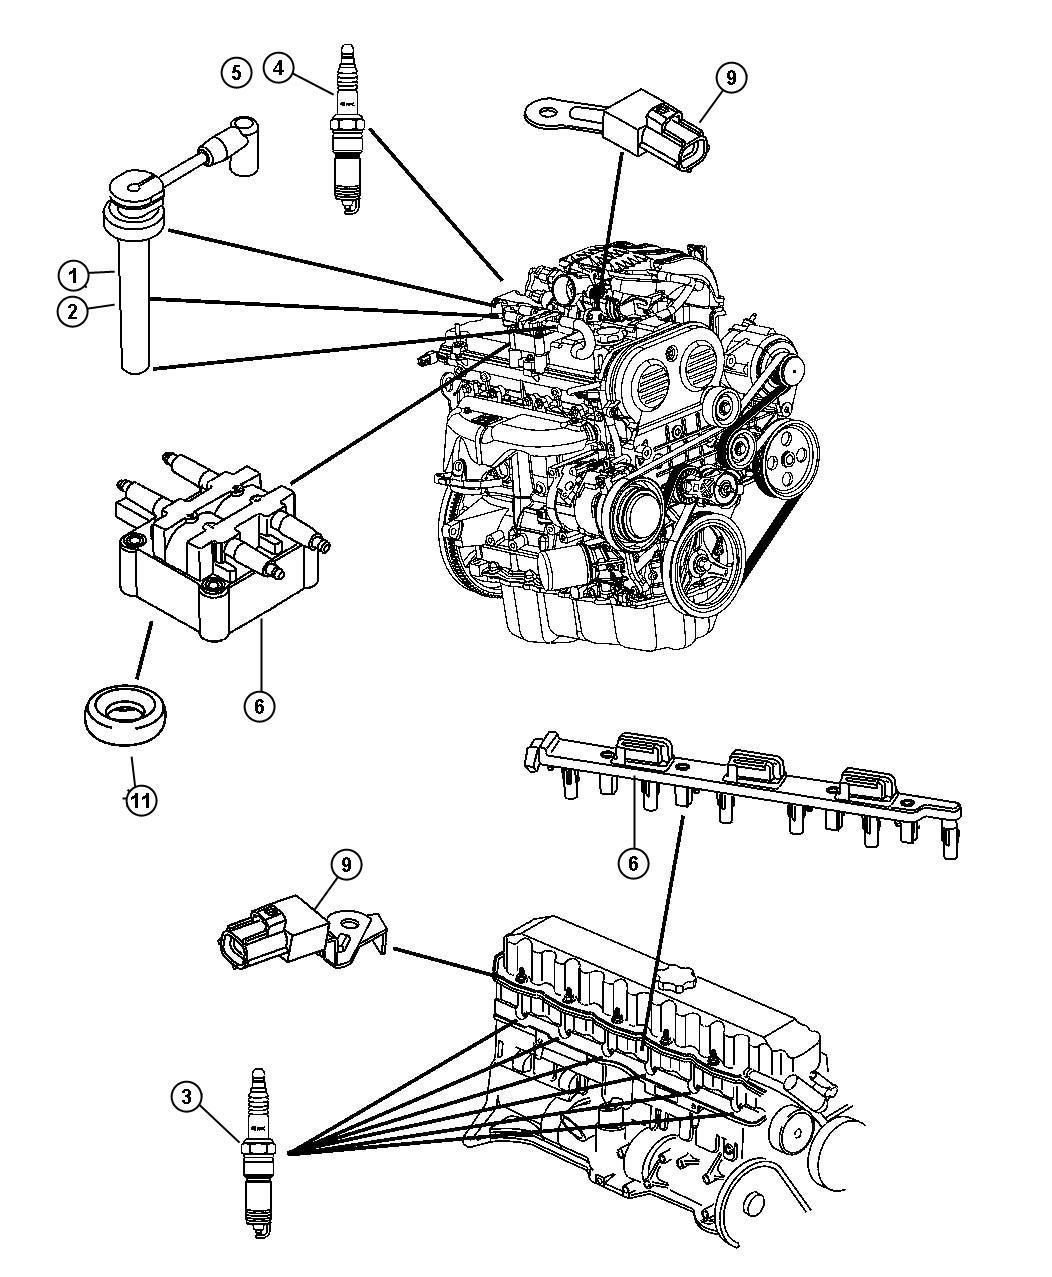 Dodge Durango Capacitor Ignition Wires